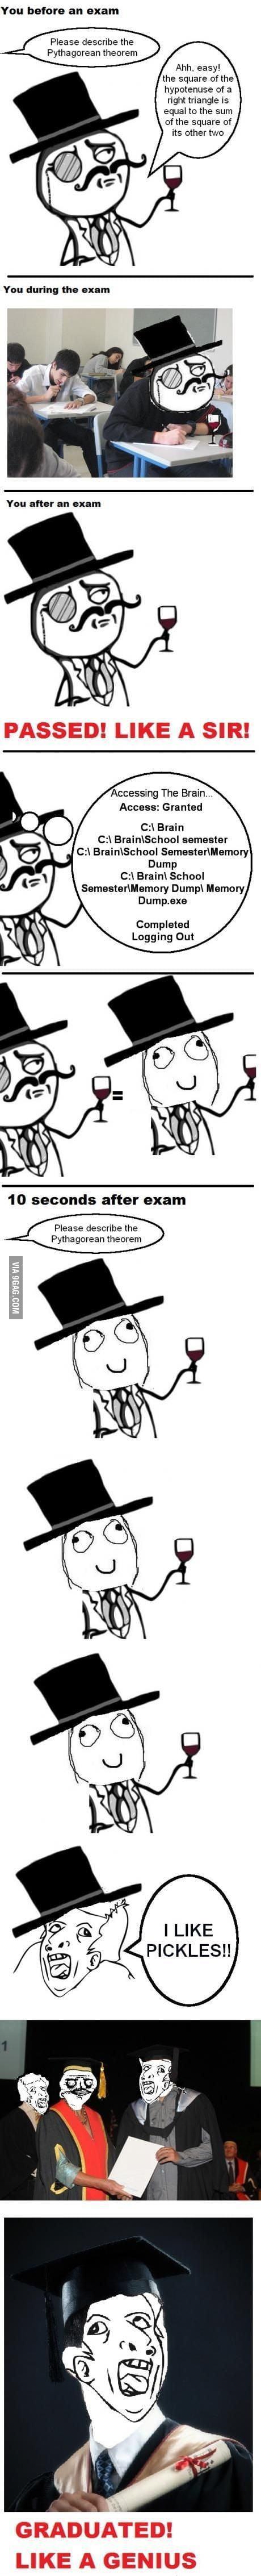 Like a genius